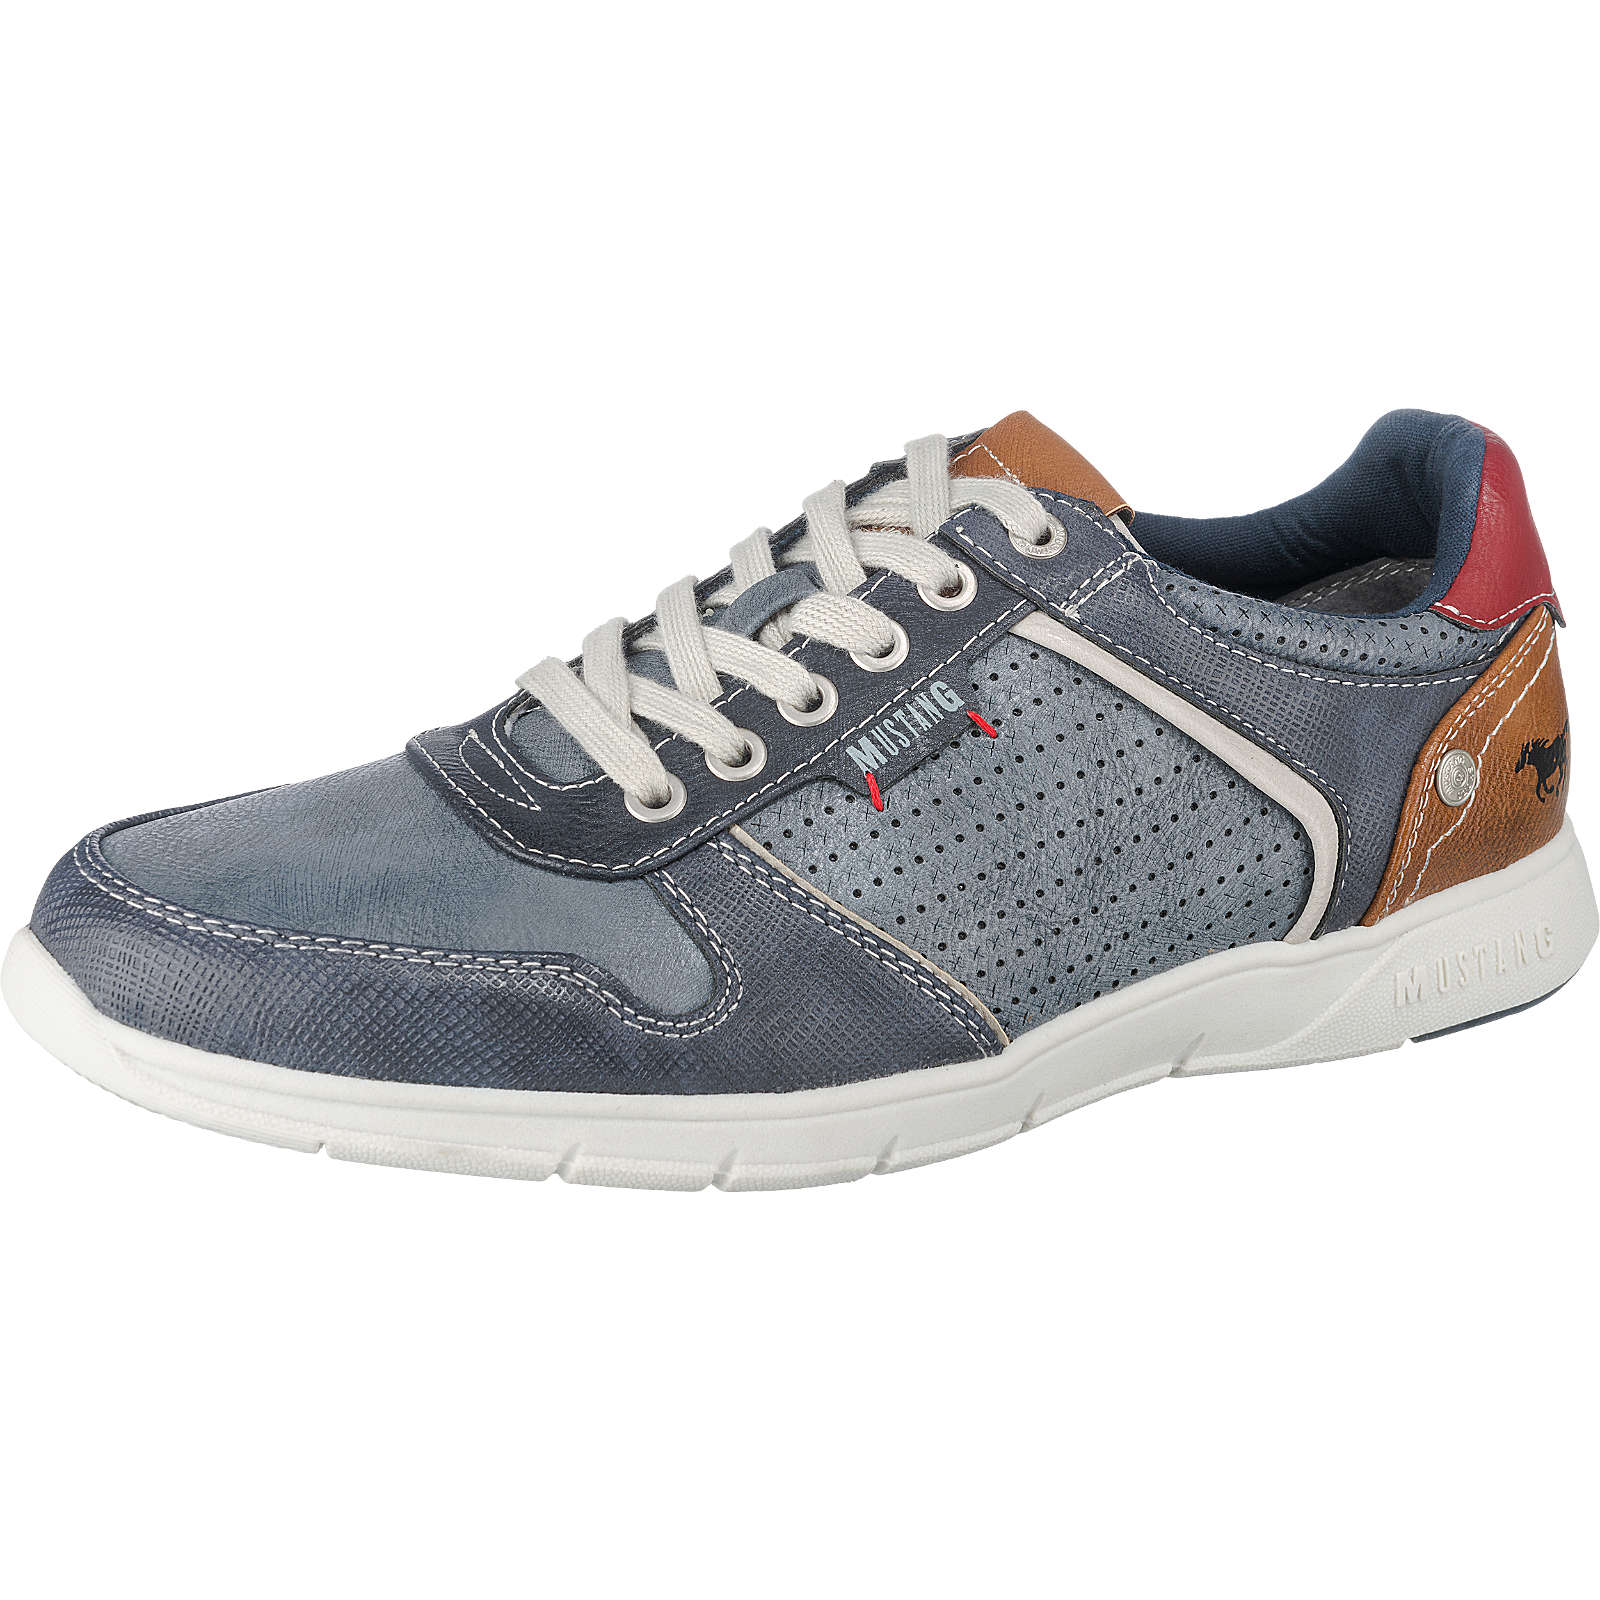 MUSTANG Sneakers blau Herren Gr. 44